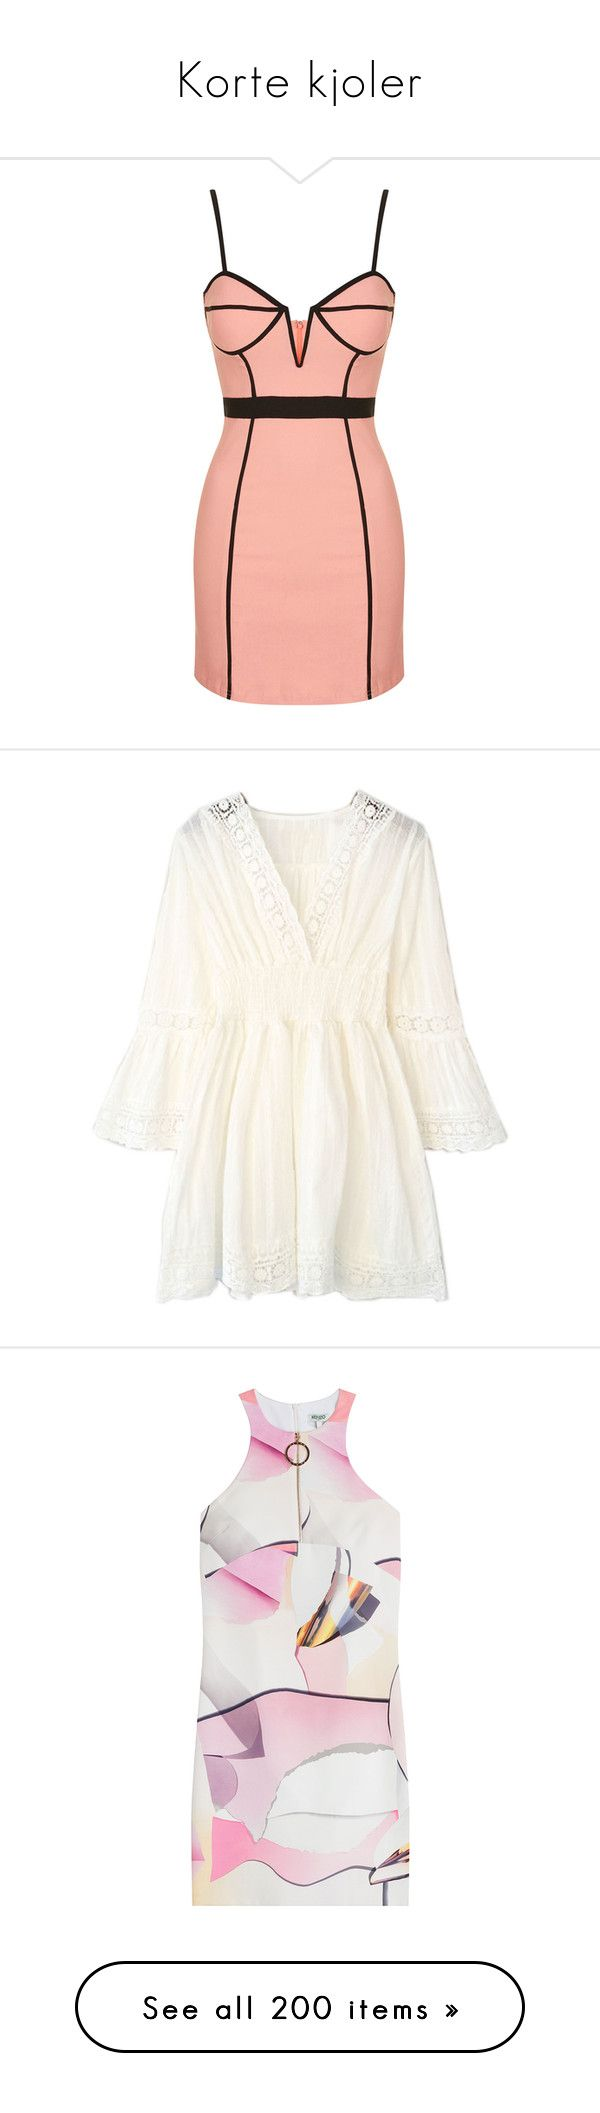 """Korte kjoler"" by kari-c ❤ liked on Polyvore featuring dresses, vestidos, short dresses, robes, blush, bodycon dress, red bustier dress, red dress, mini dress and white"